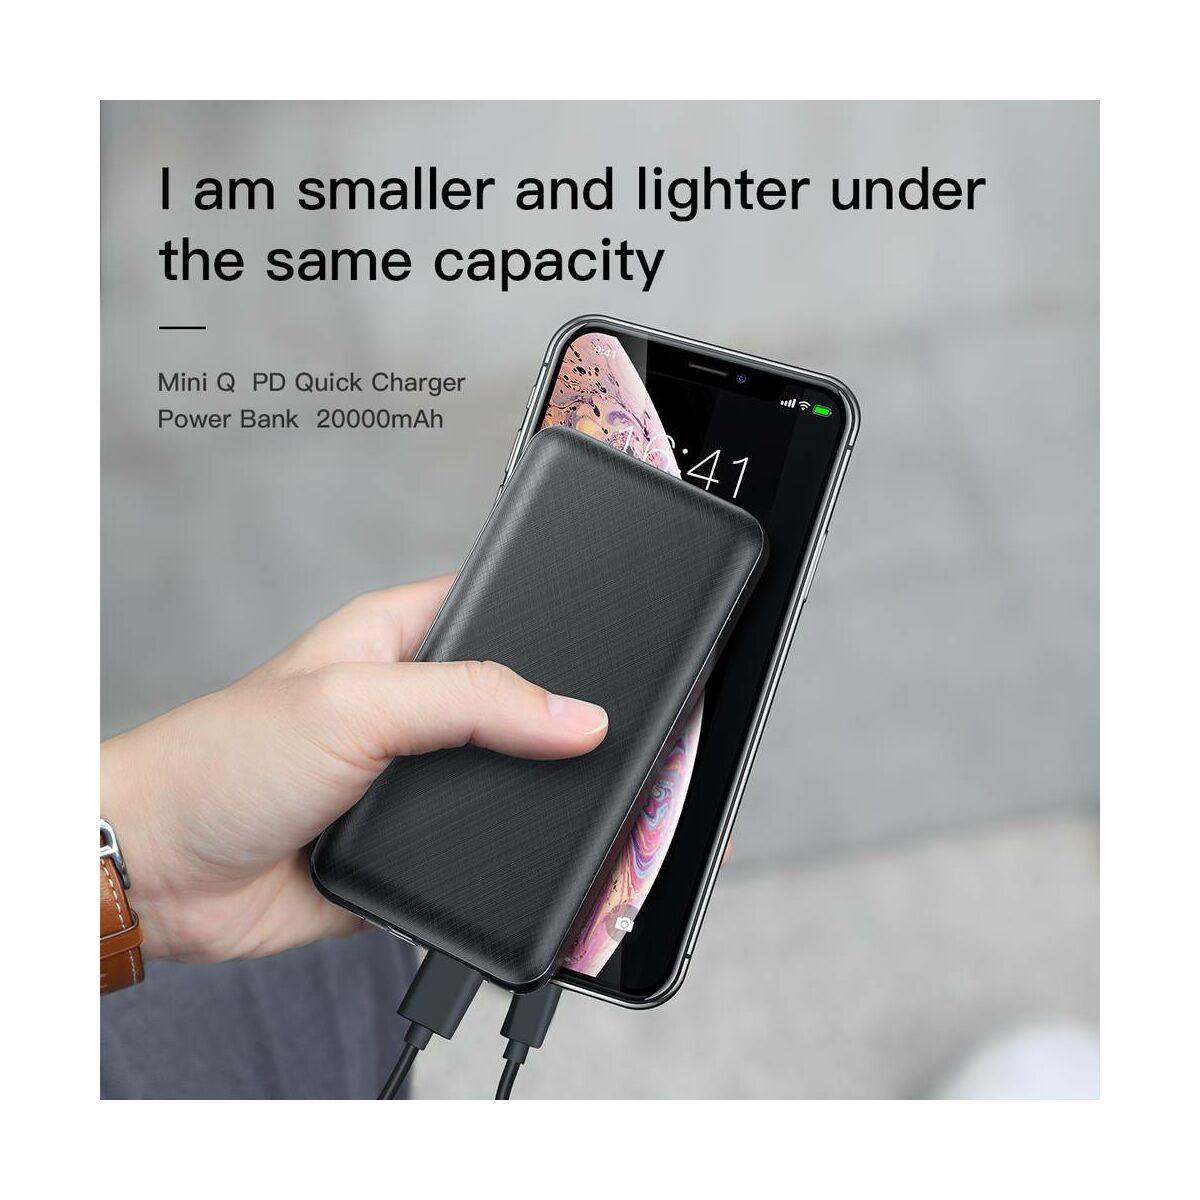 Baseus Power Bank Mini Q, PD gyors töltés, (Micro USB + Type-C + Lightning bem. / USB + Type-C PD kim.), 3A, 20.000 mAh, fekete (PPALL-DXQ01